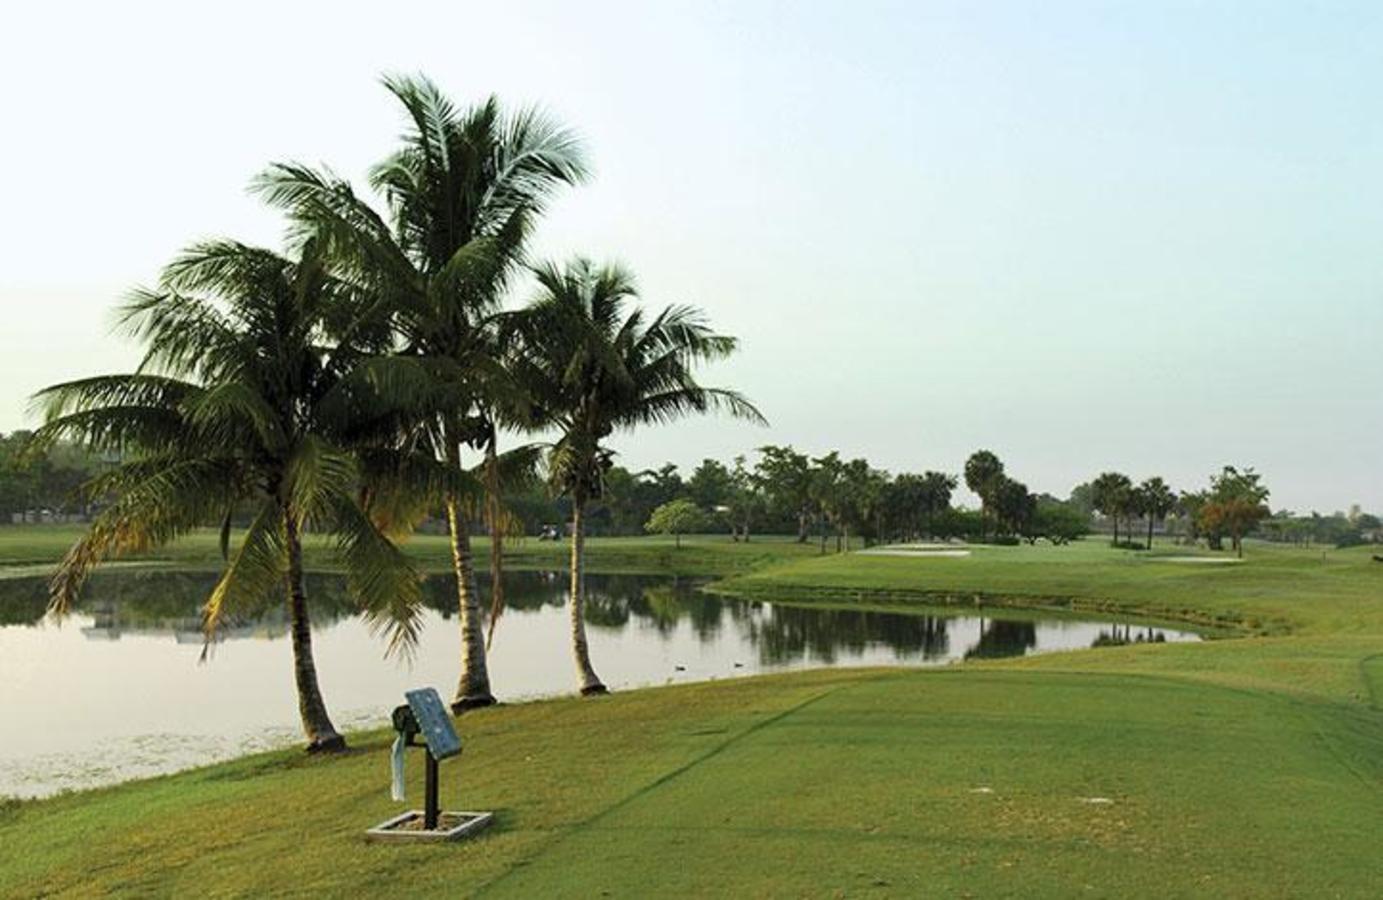 The natural beauty of South Florida at Briar Bay Golf Course